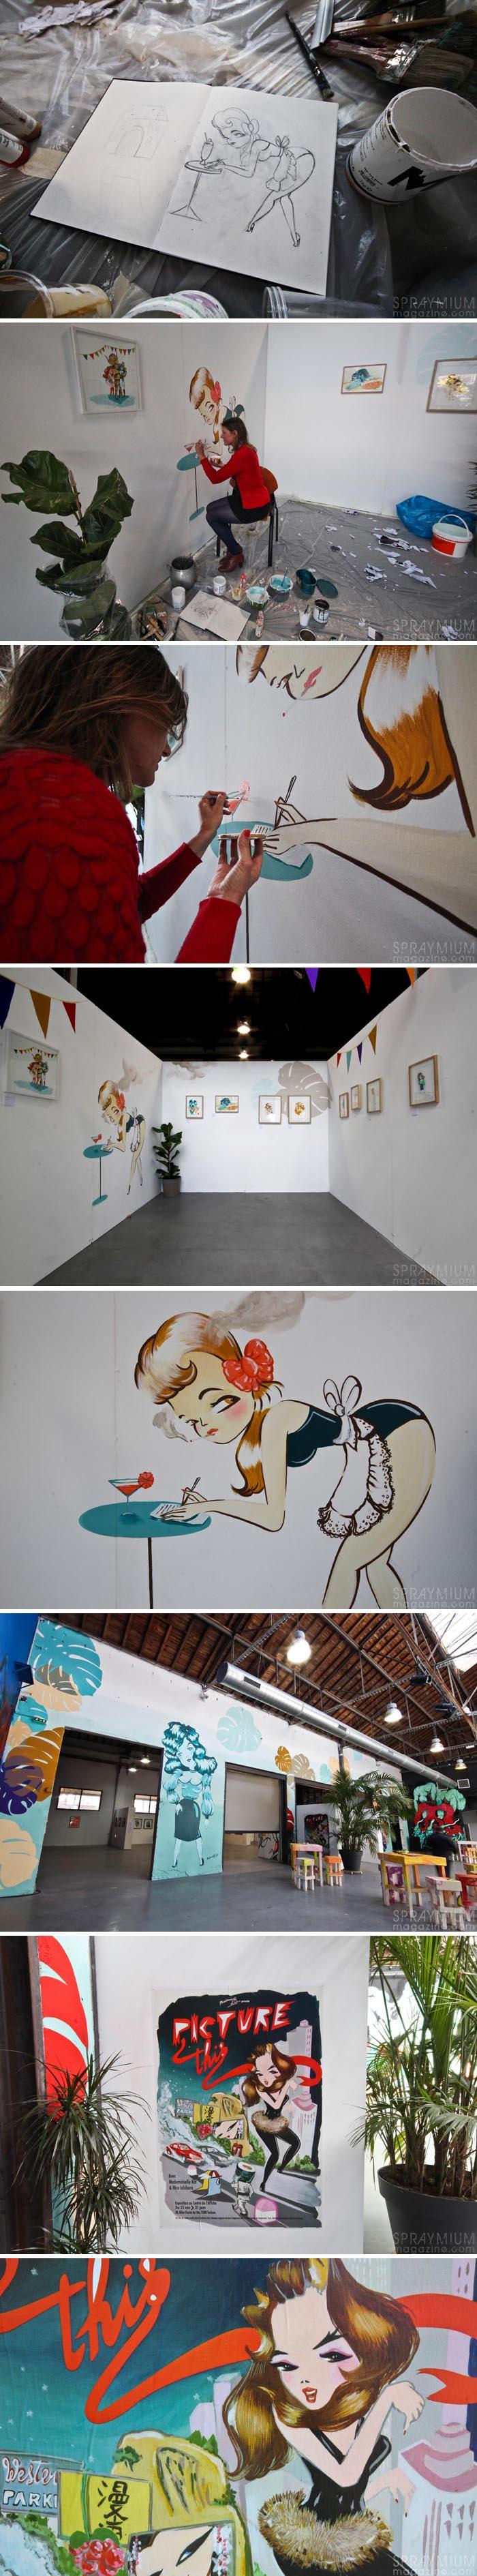 exposition mister freeze toulouse art urbain contemporain graffiti postgraffiti streetart muralism spraymium kat